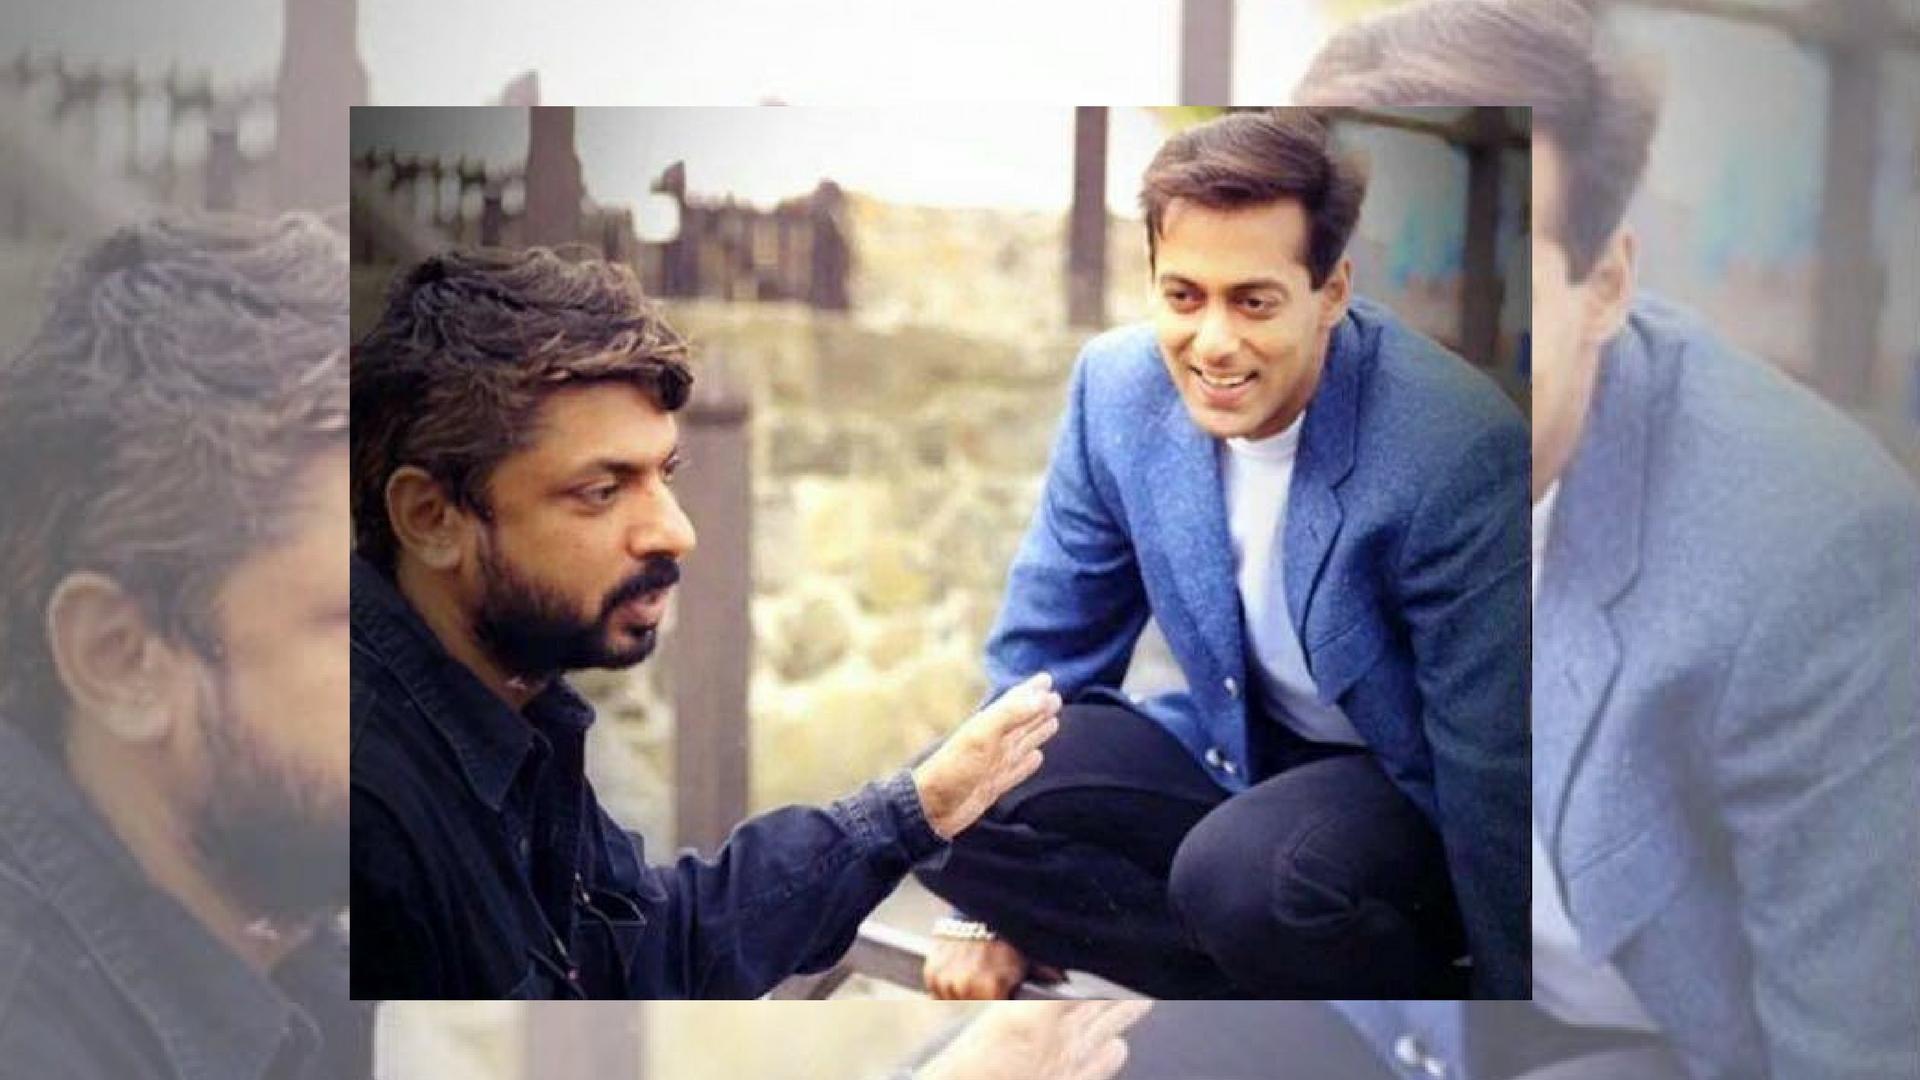 Sanjay Leela Bhansali, Salman Khan Reunite for Another Love Story